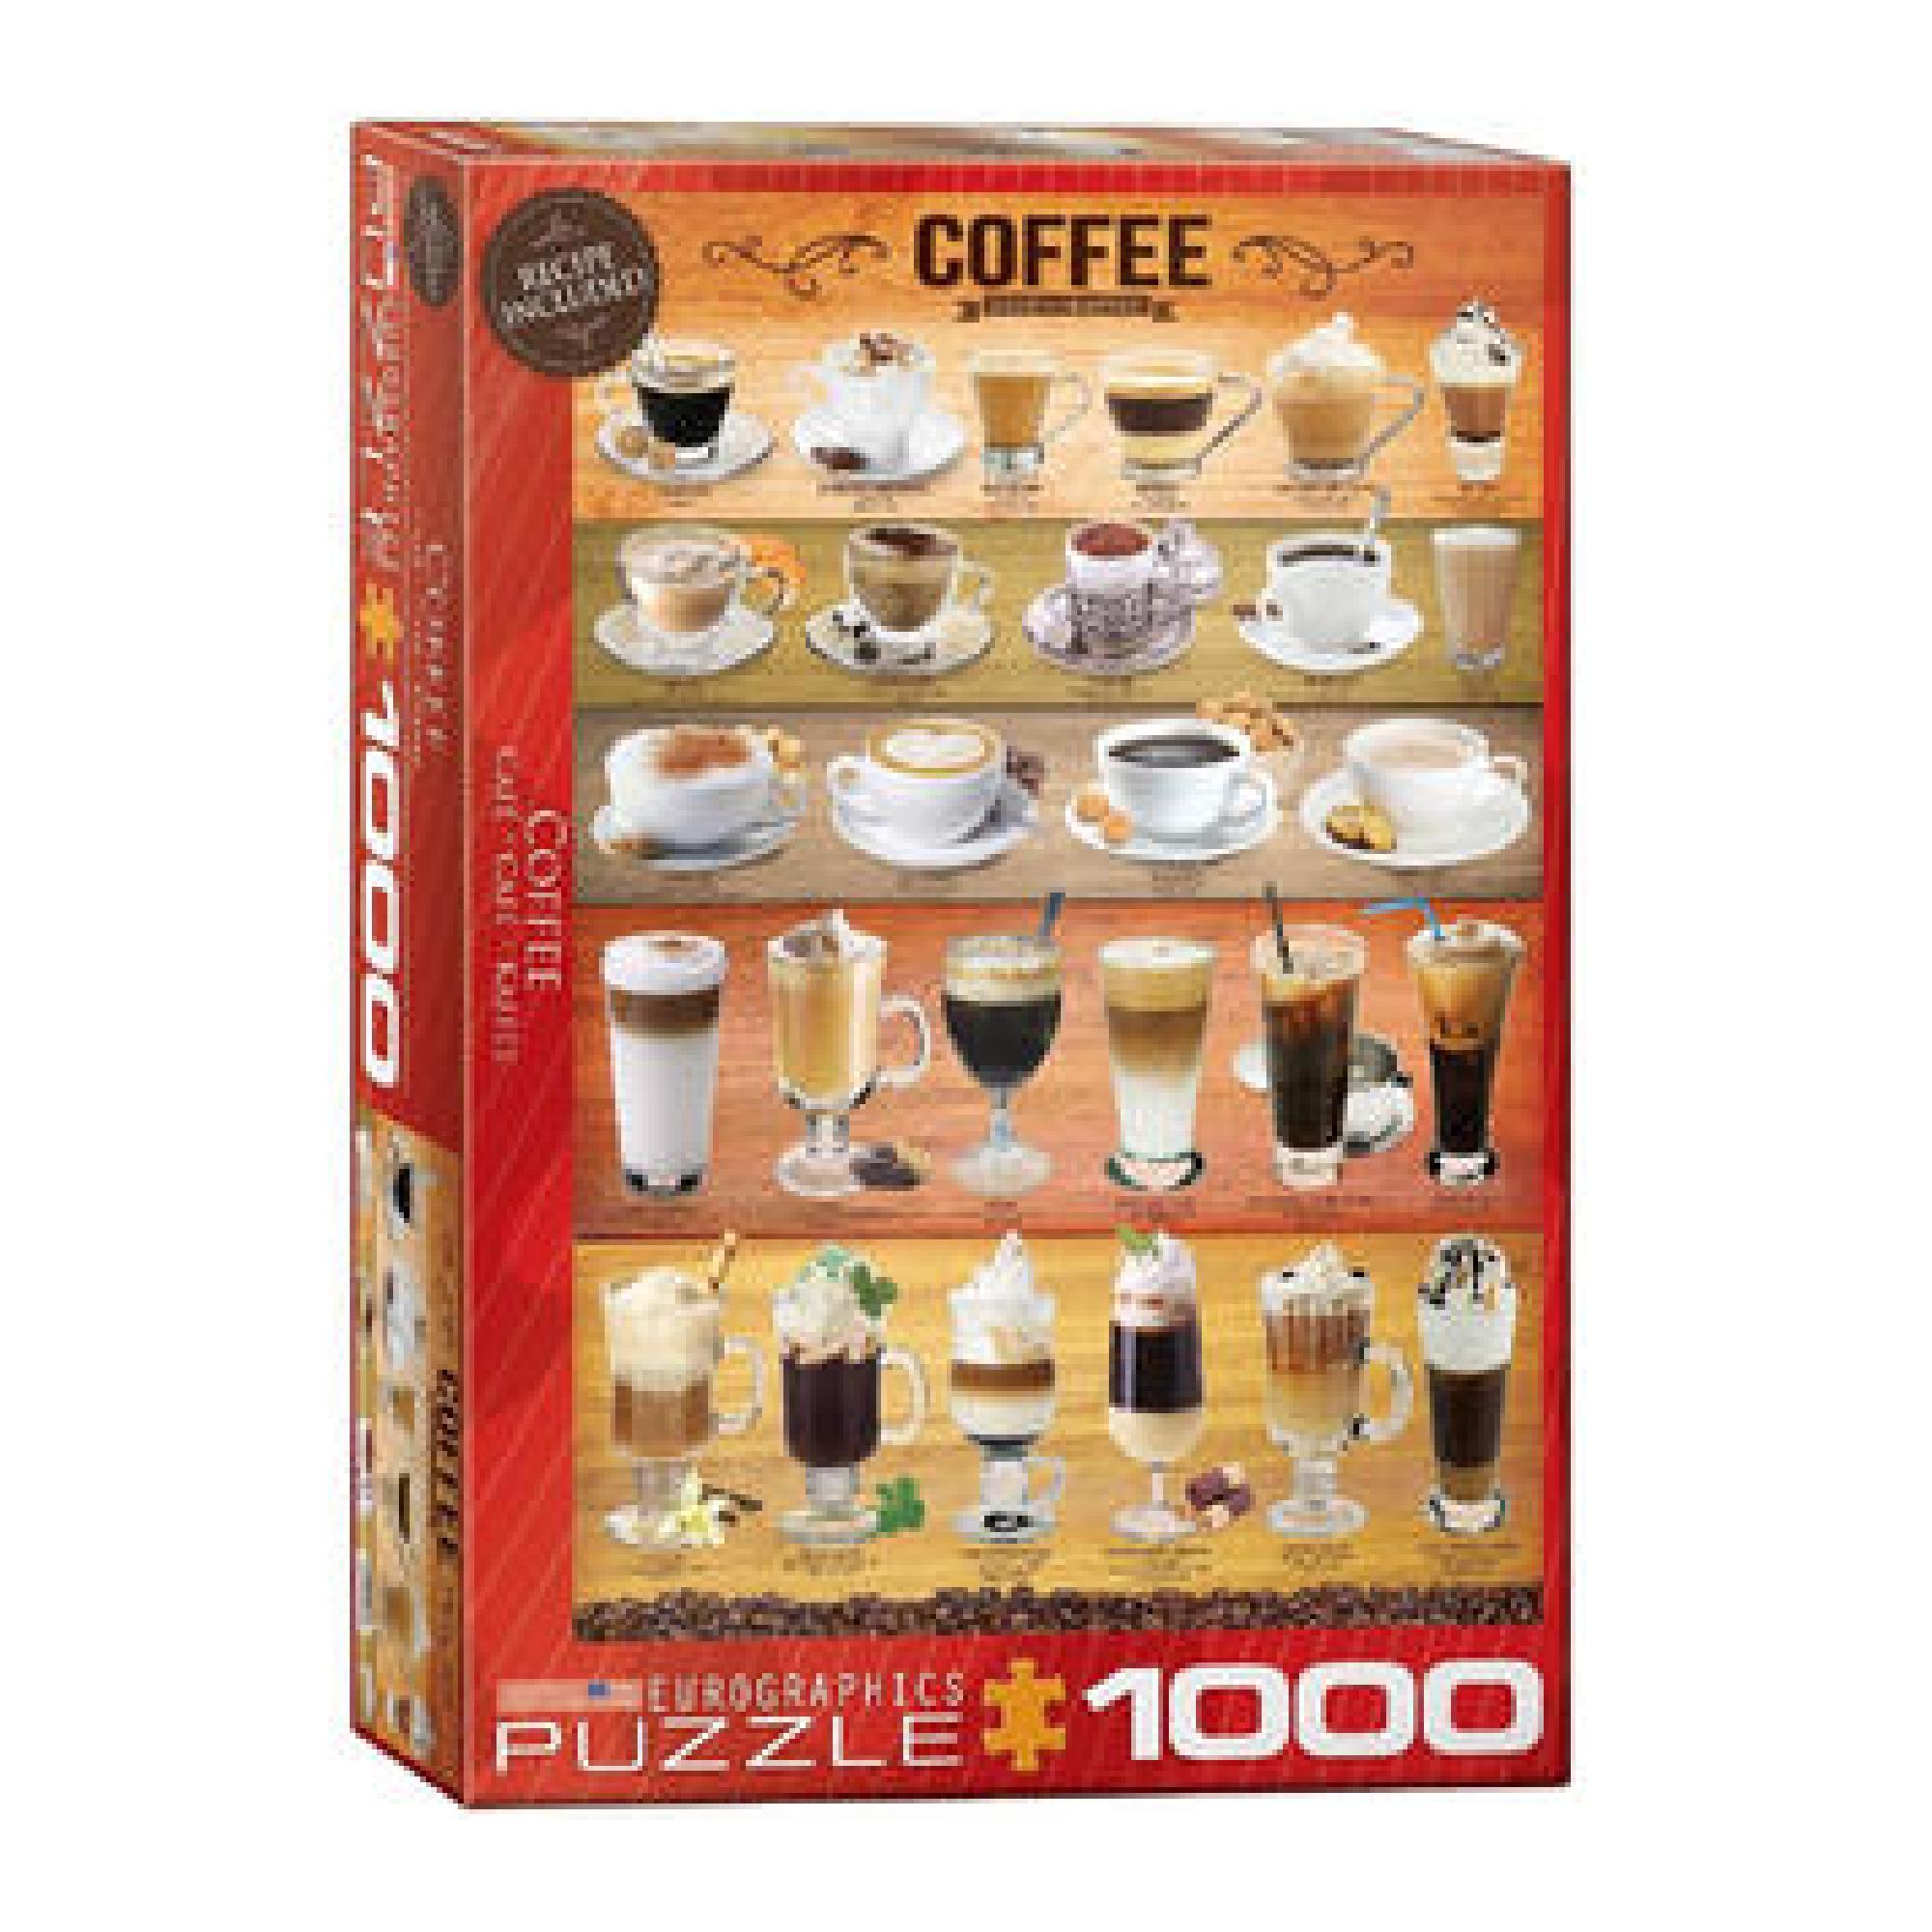 Eurographics Puzzle 1000: Coffee